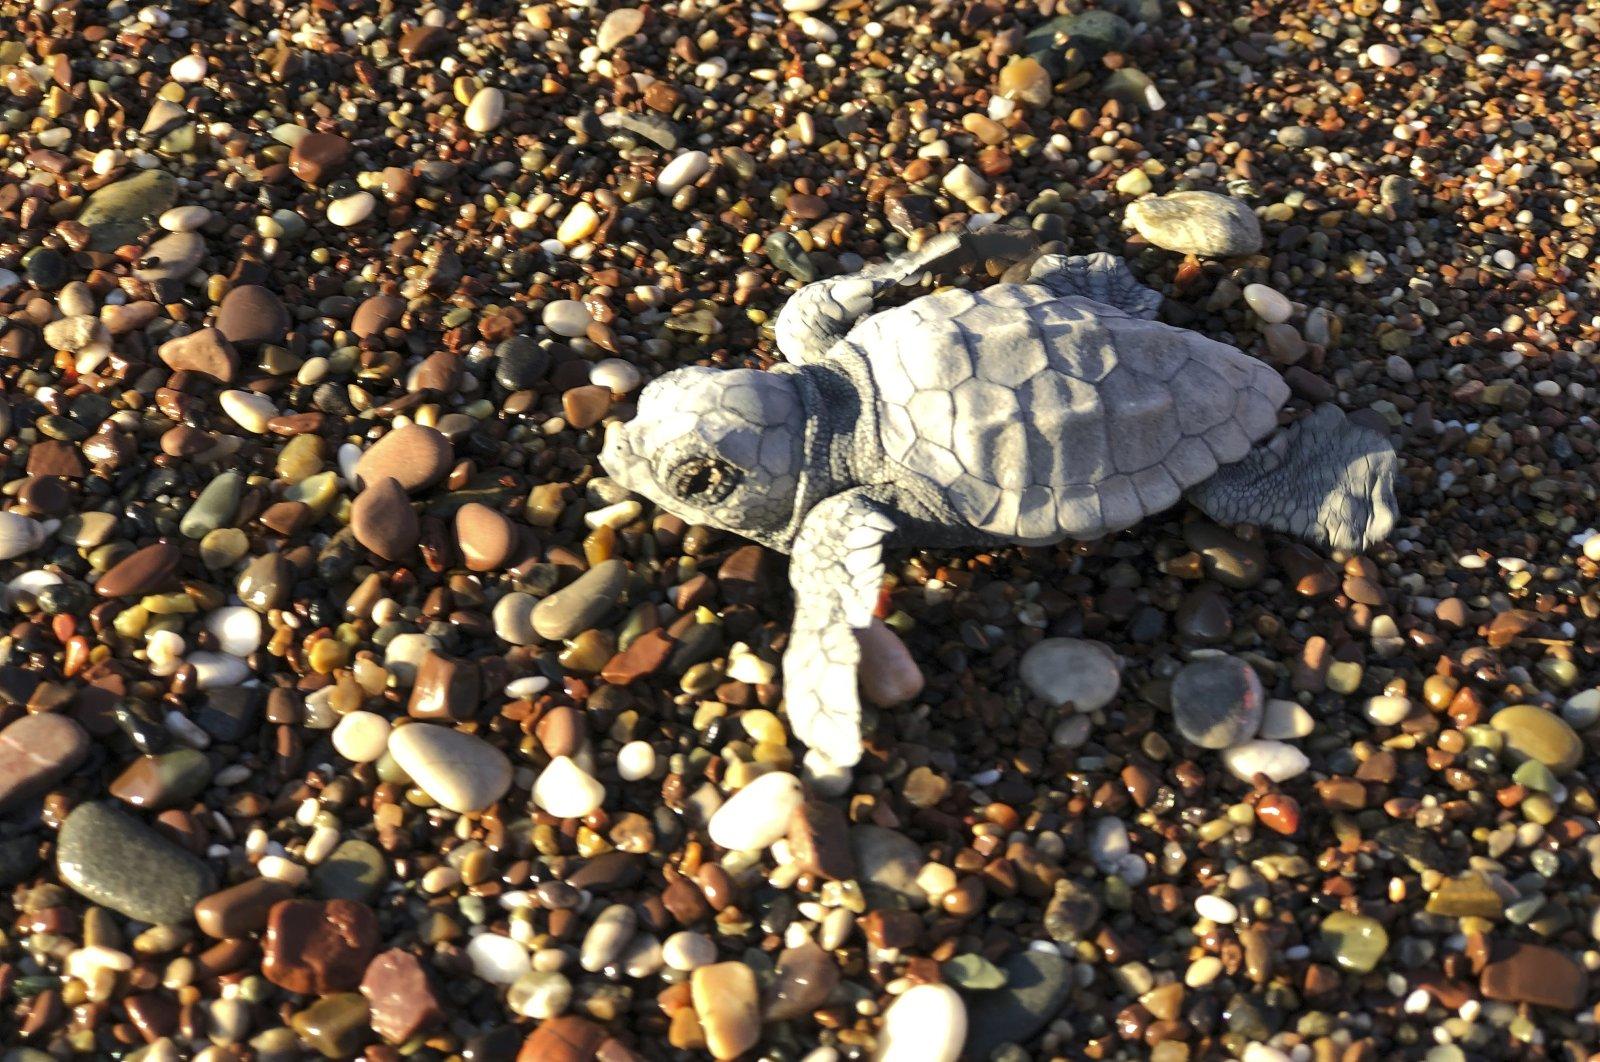 A baby loggerhead turtle (Caretta caretta) struggles to reach the Mediterranean Sea, in Adrasan, Antalya, Turkey, Aug. 11, 2019. (AP Photo)